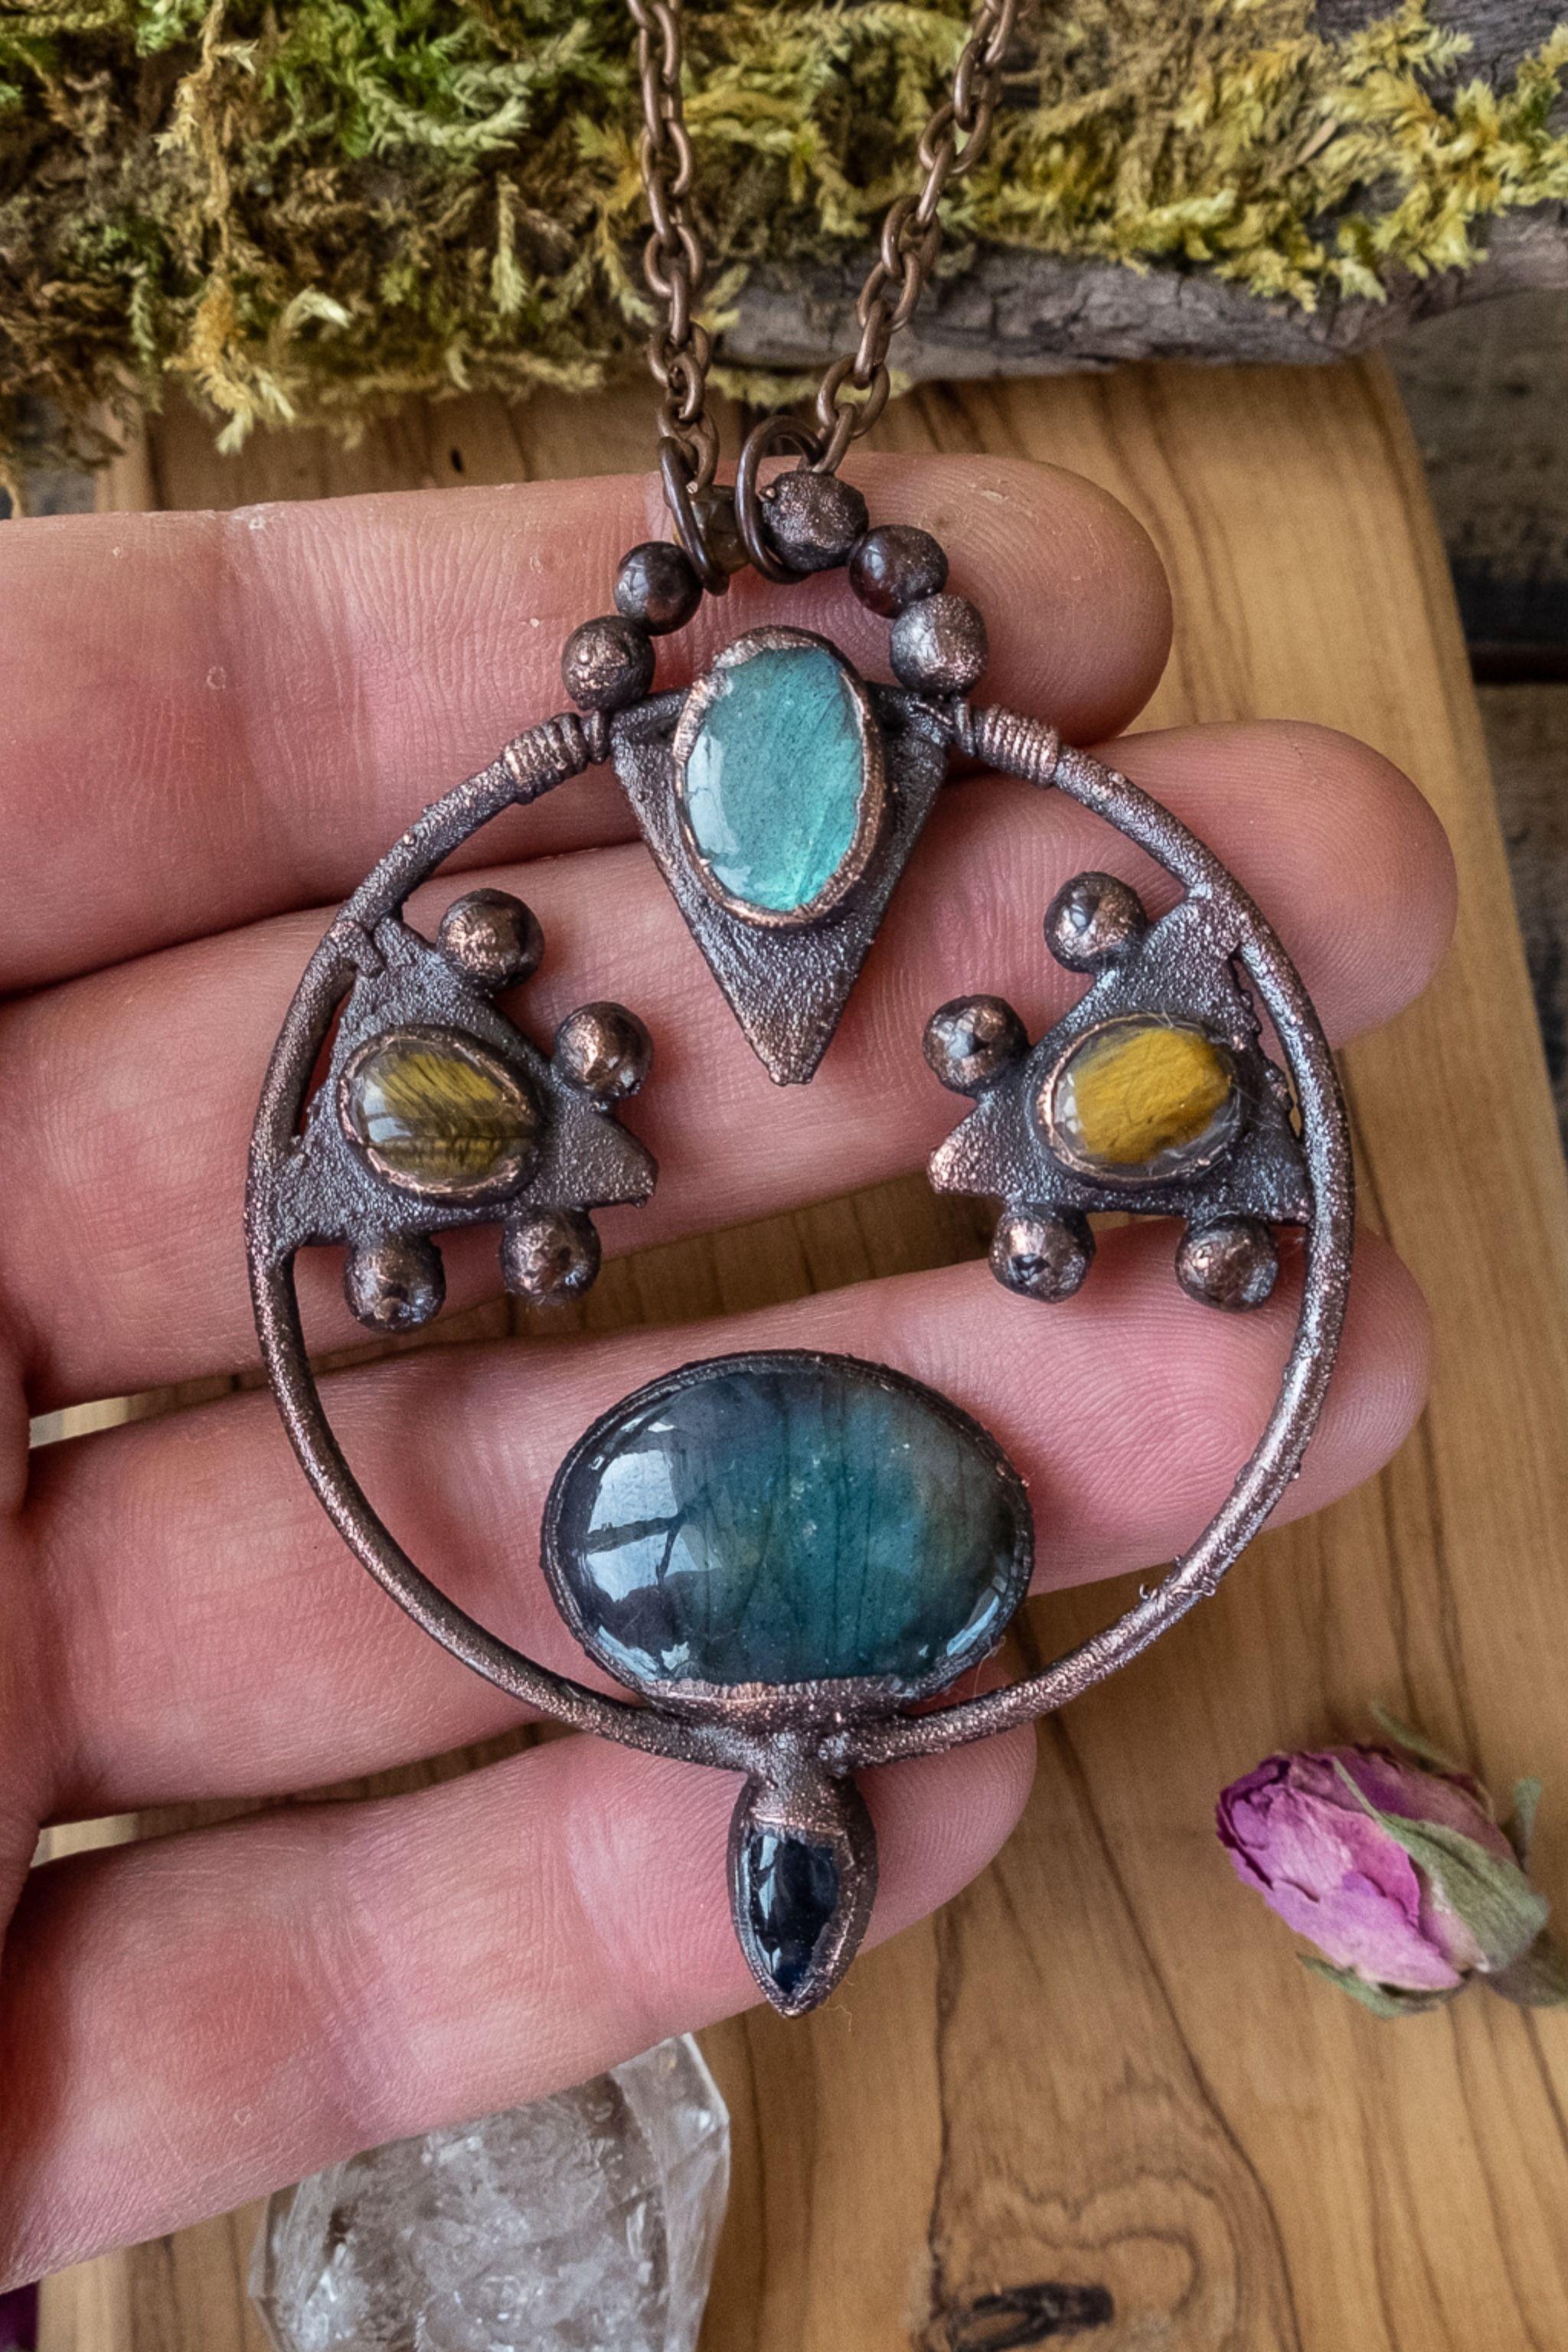 Electroformed Necklace Wiccan Necklace Gothic Necklace Raw Crystal Necklace Statement Crystal Necklace Labradorite Necklace